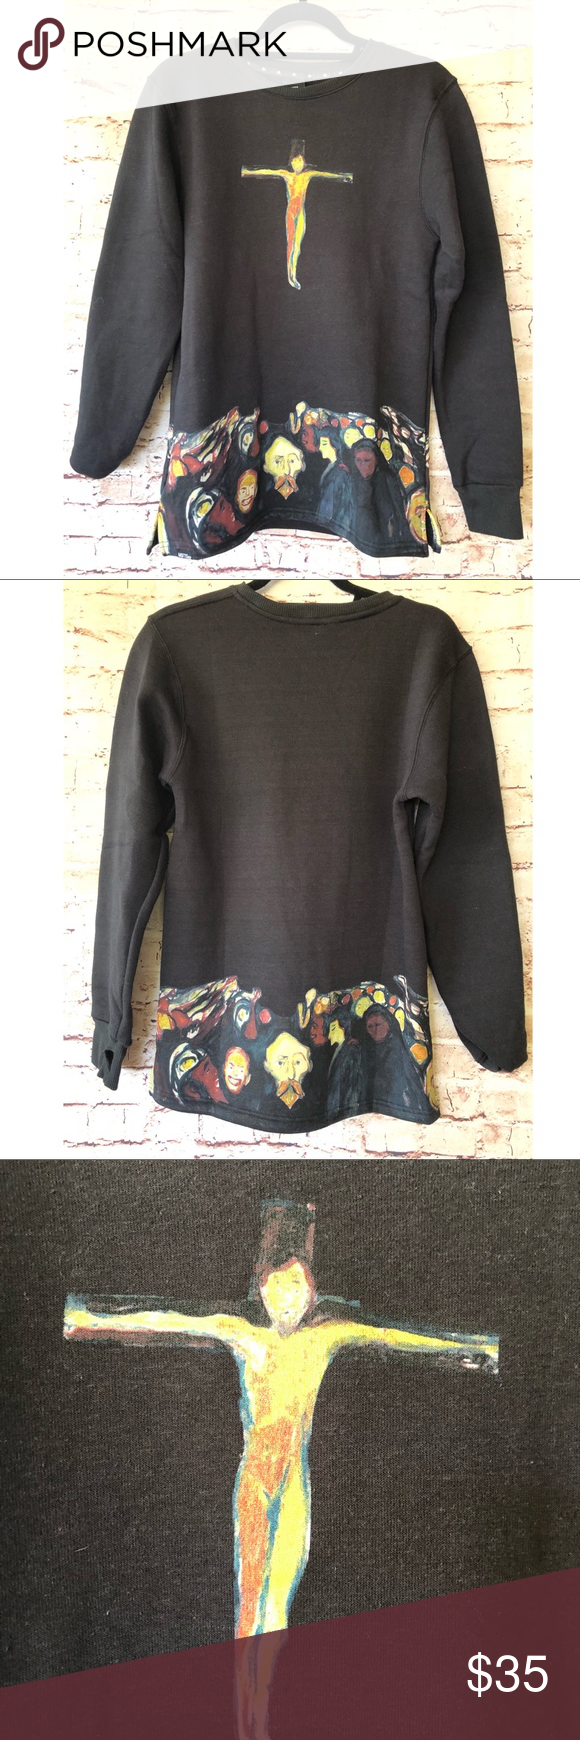 NWT MSFTSrep Jaden Smith | Clothes design, Jaden smith ...